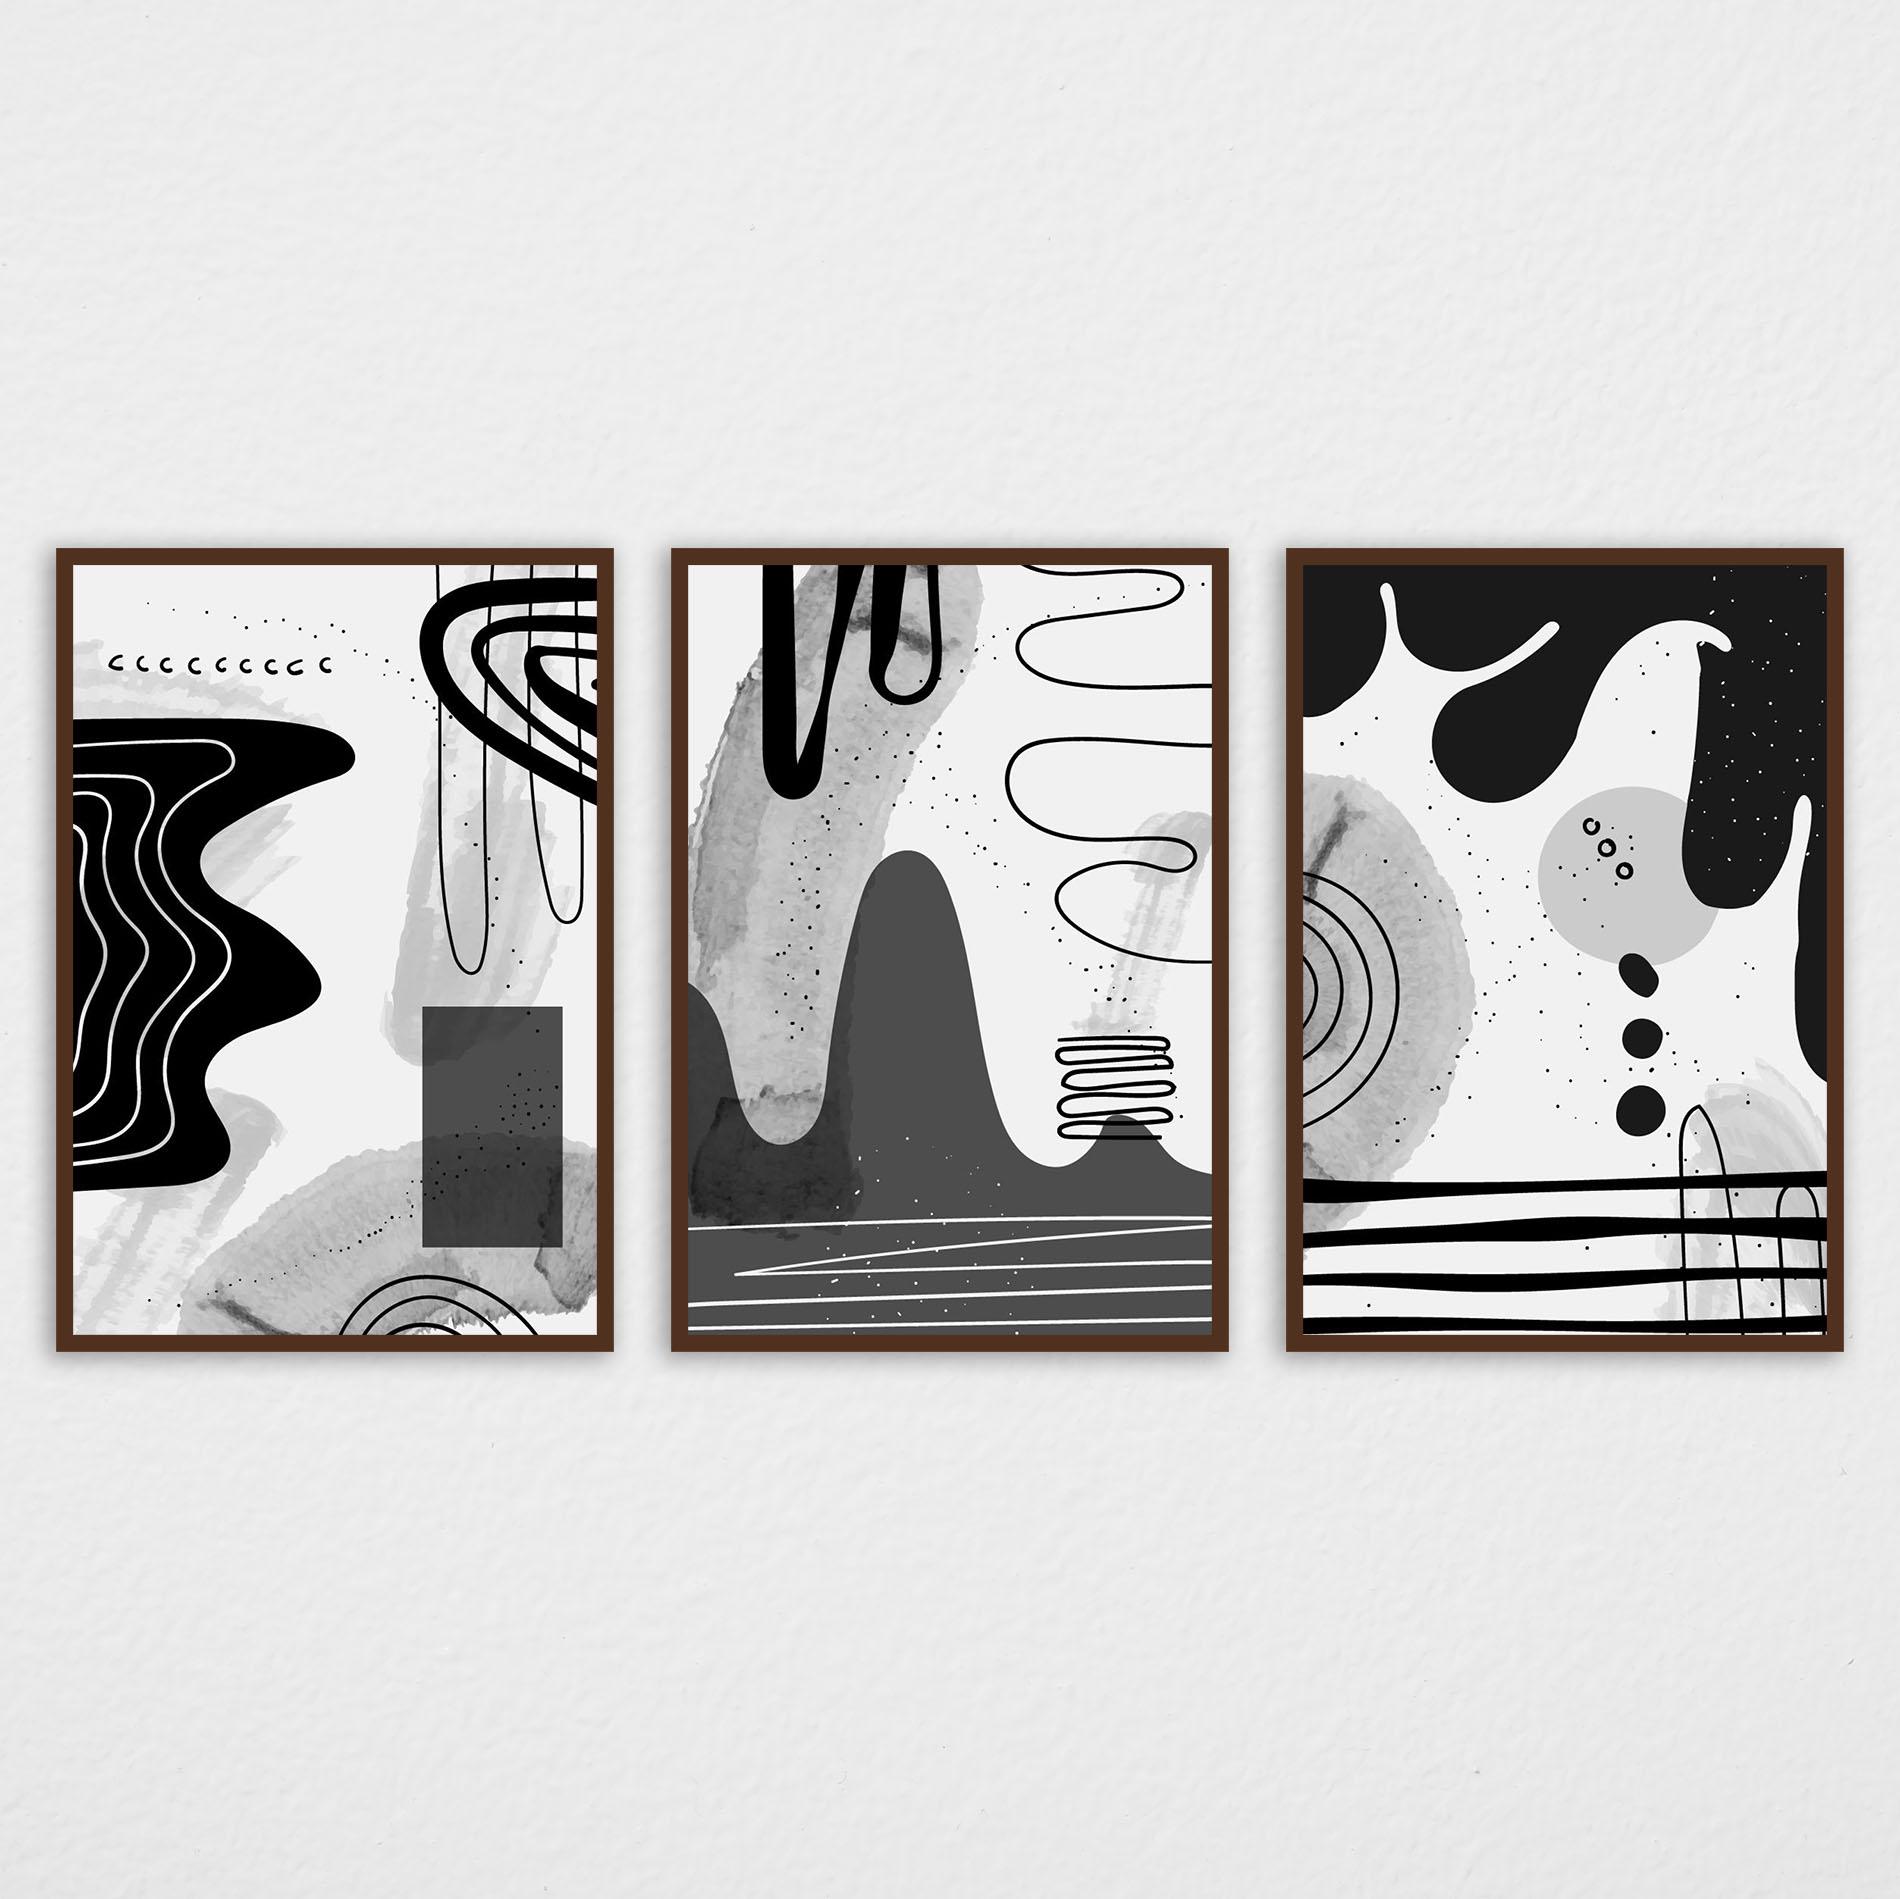 Conjunto de Quadros Abstratos Preto e Branco